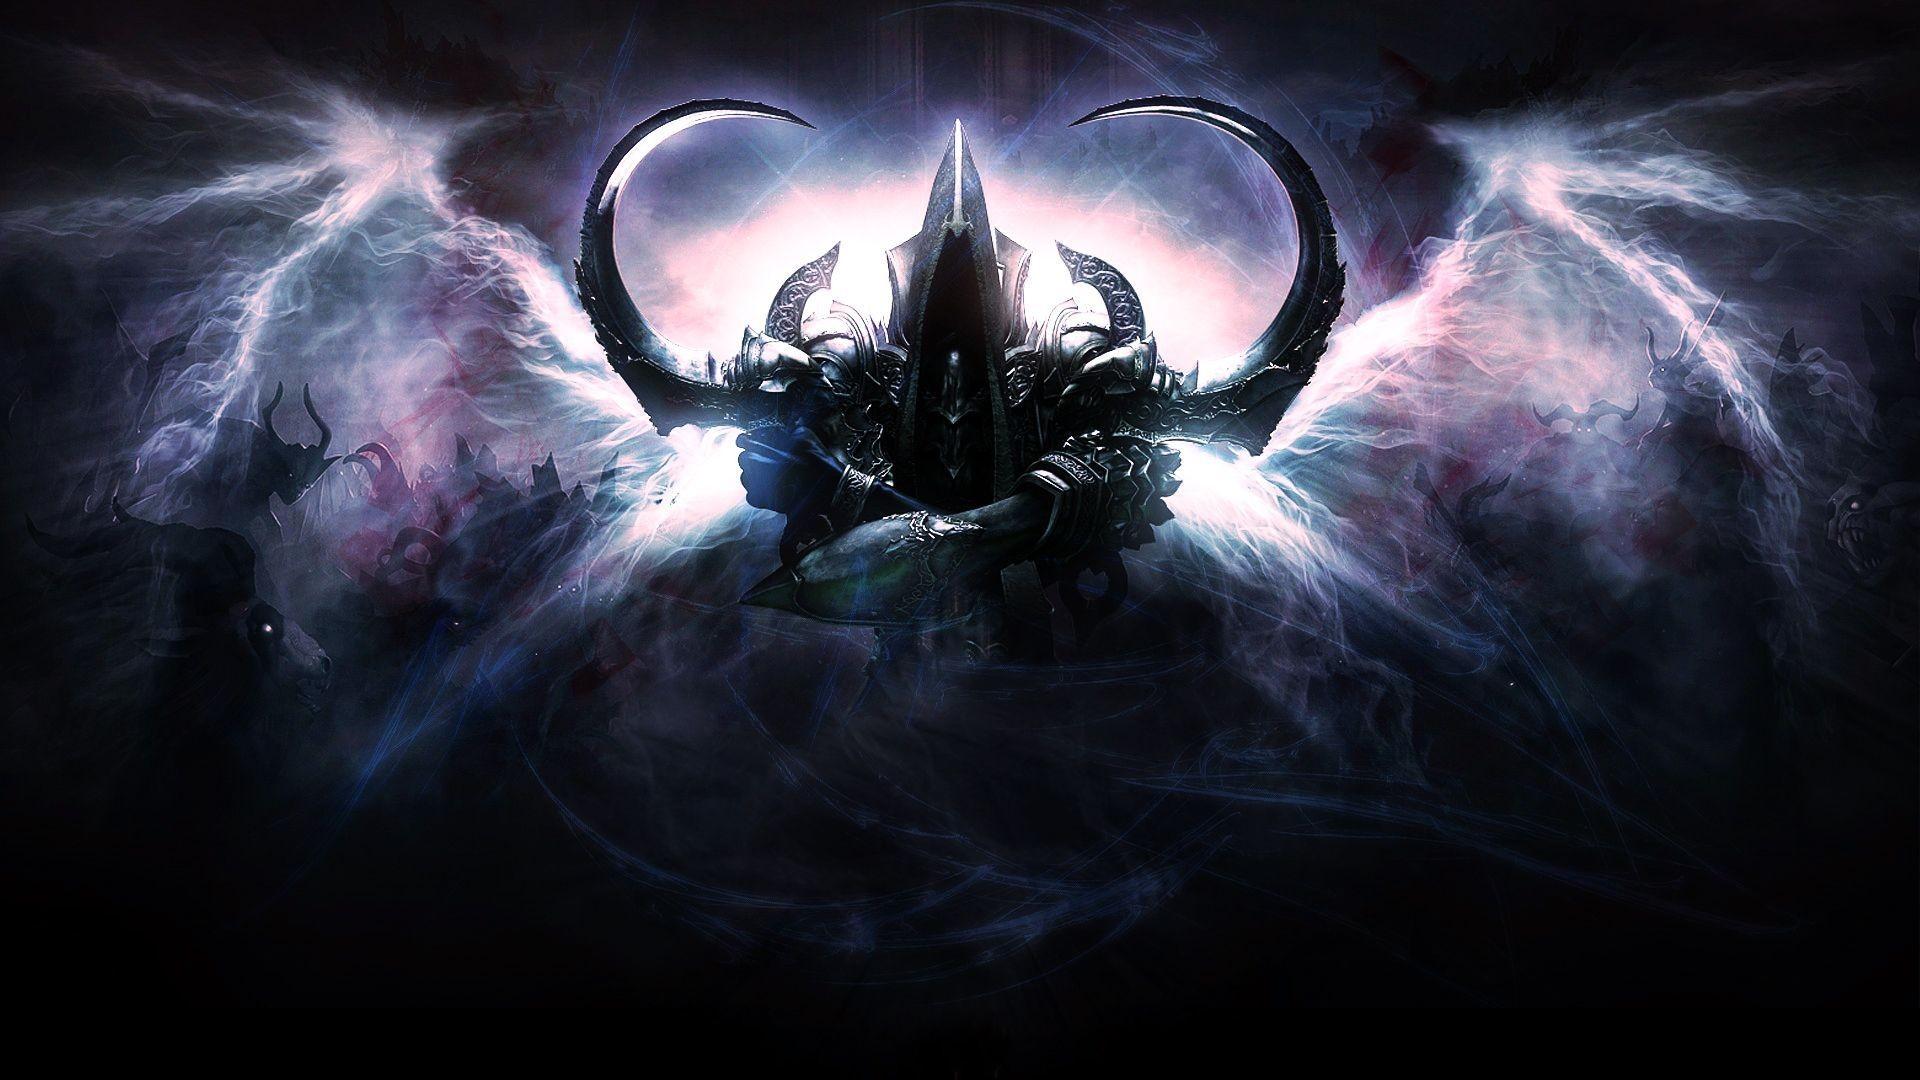 Diablo 3 Reaper Of Souls Wallpapers: HD Diablo 3 Wallpapers (80+ Images